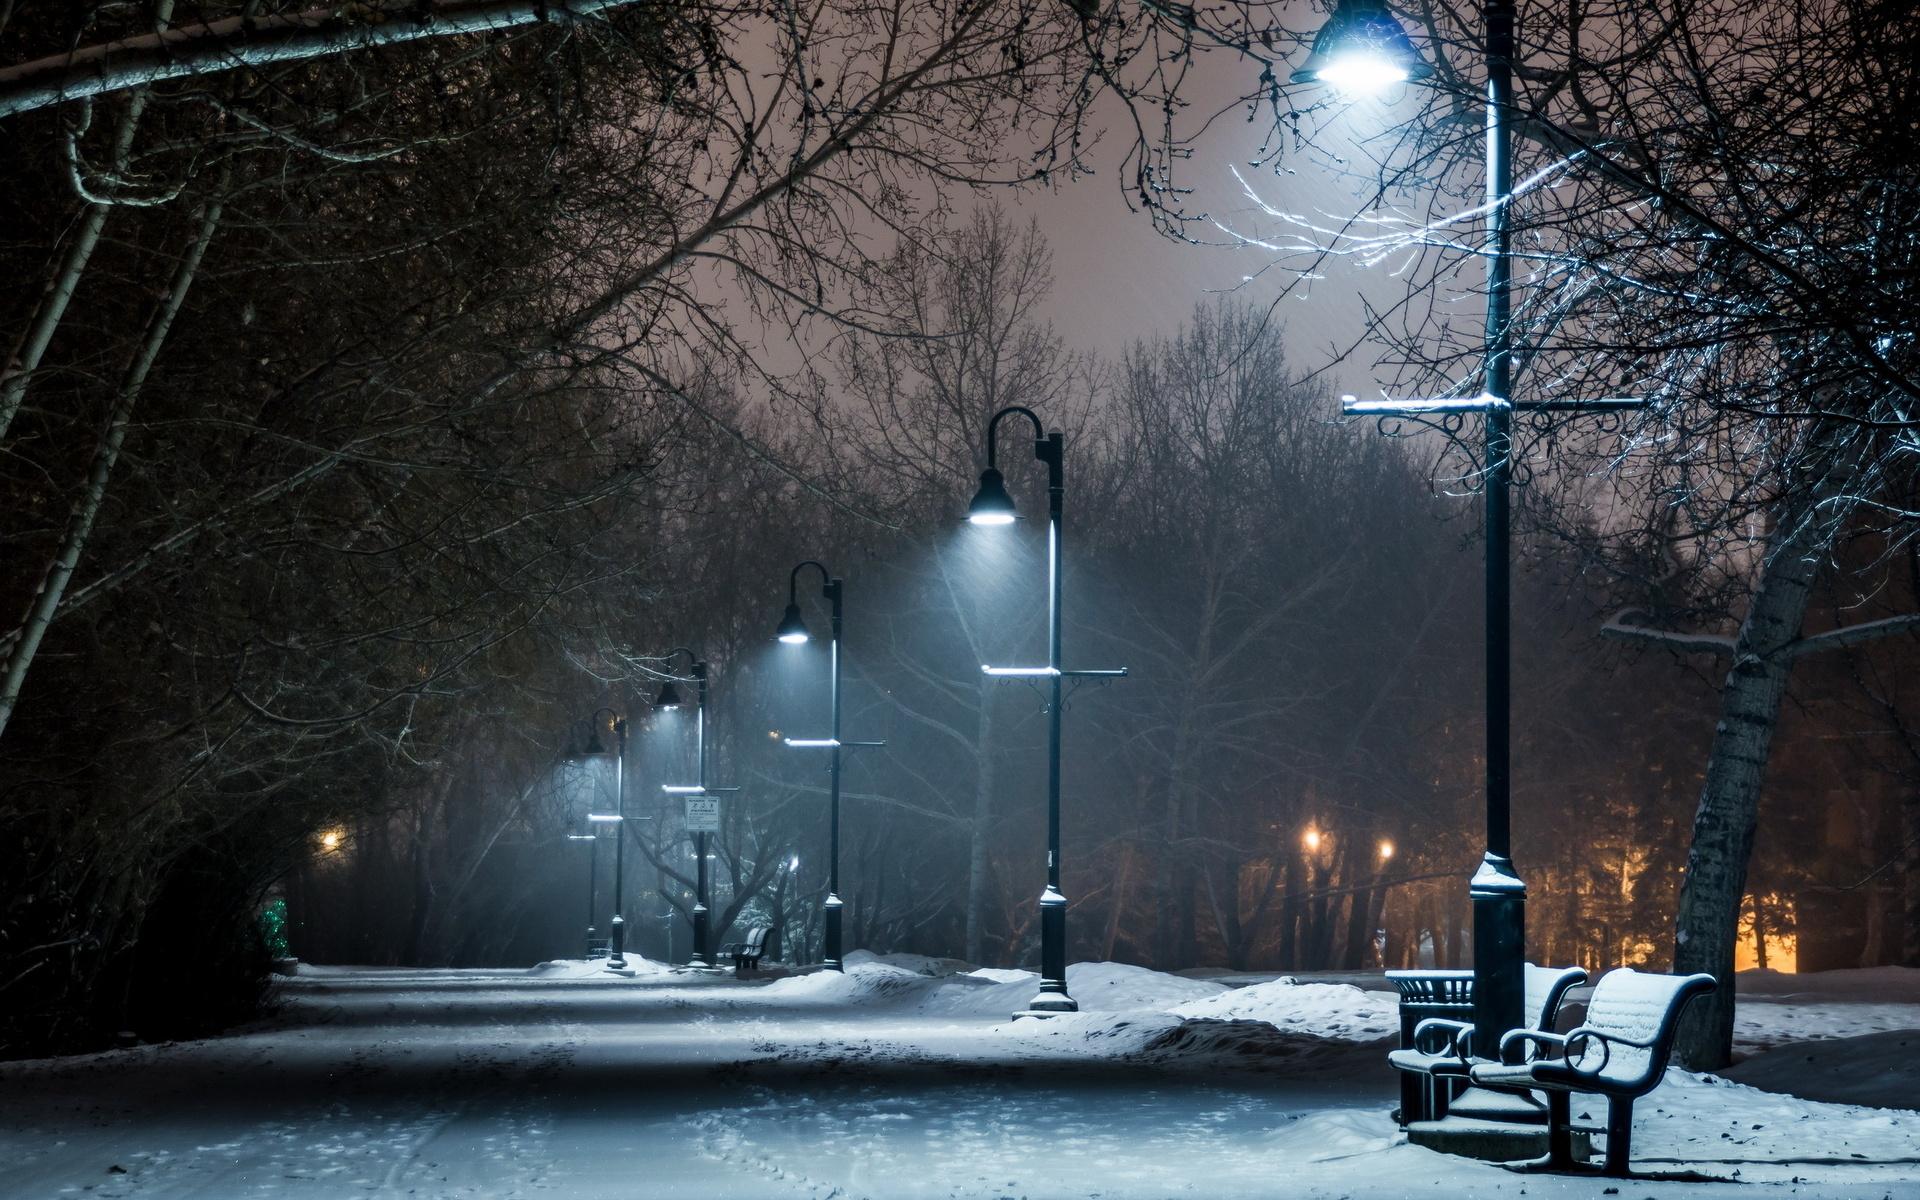 Park Winter Snow Bench Lights Lamp Post Night Path Trail Wallpaper 1920x1200 46701 Wallpaperup